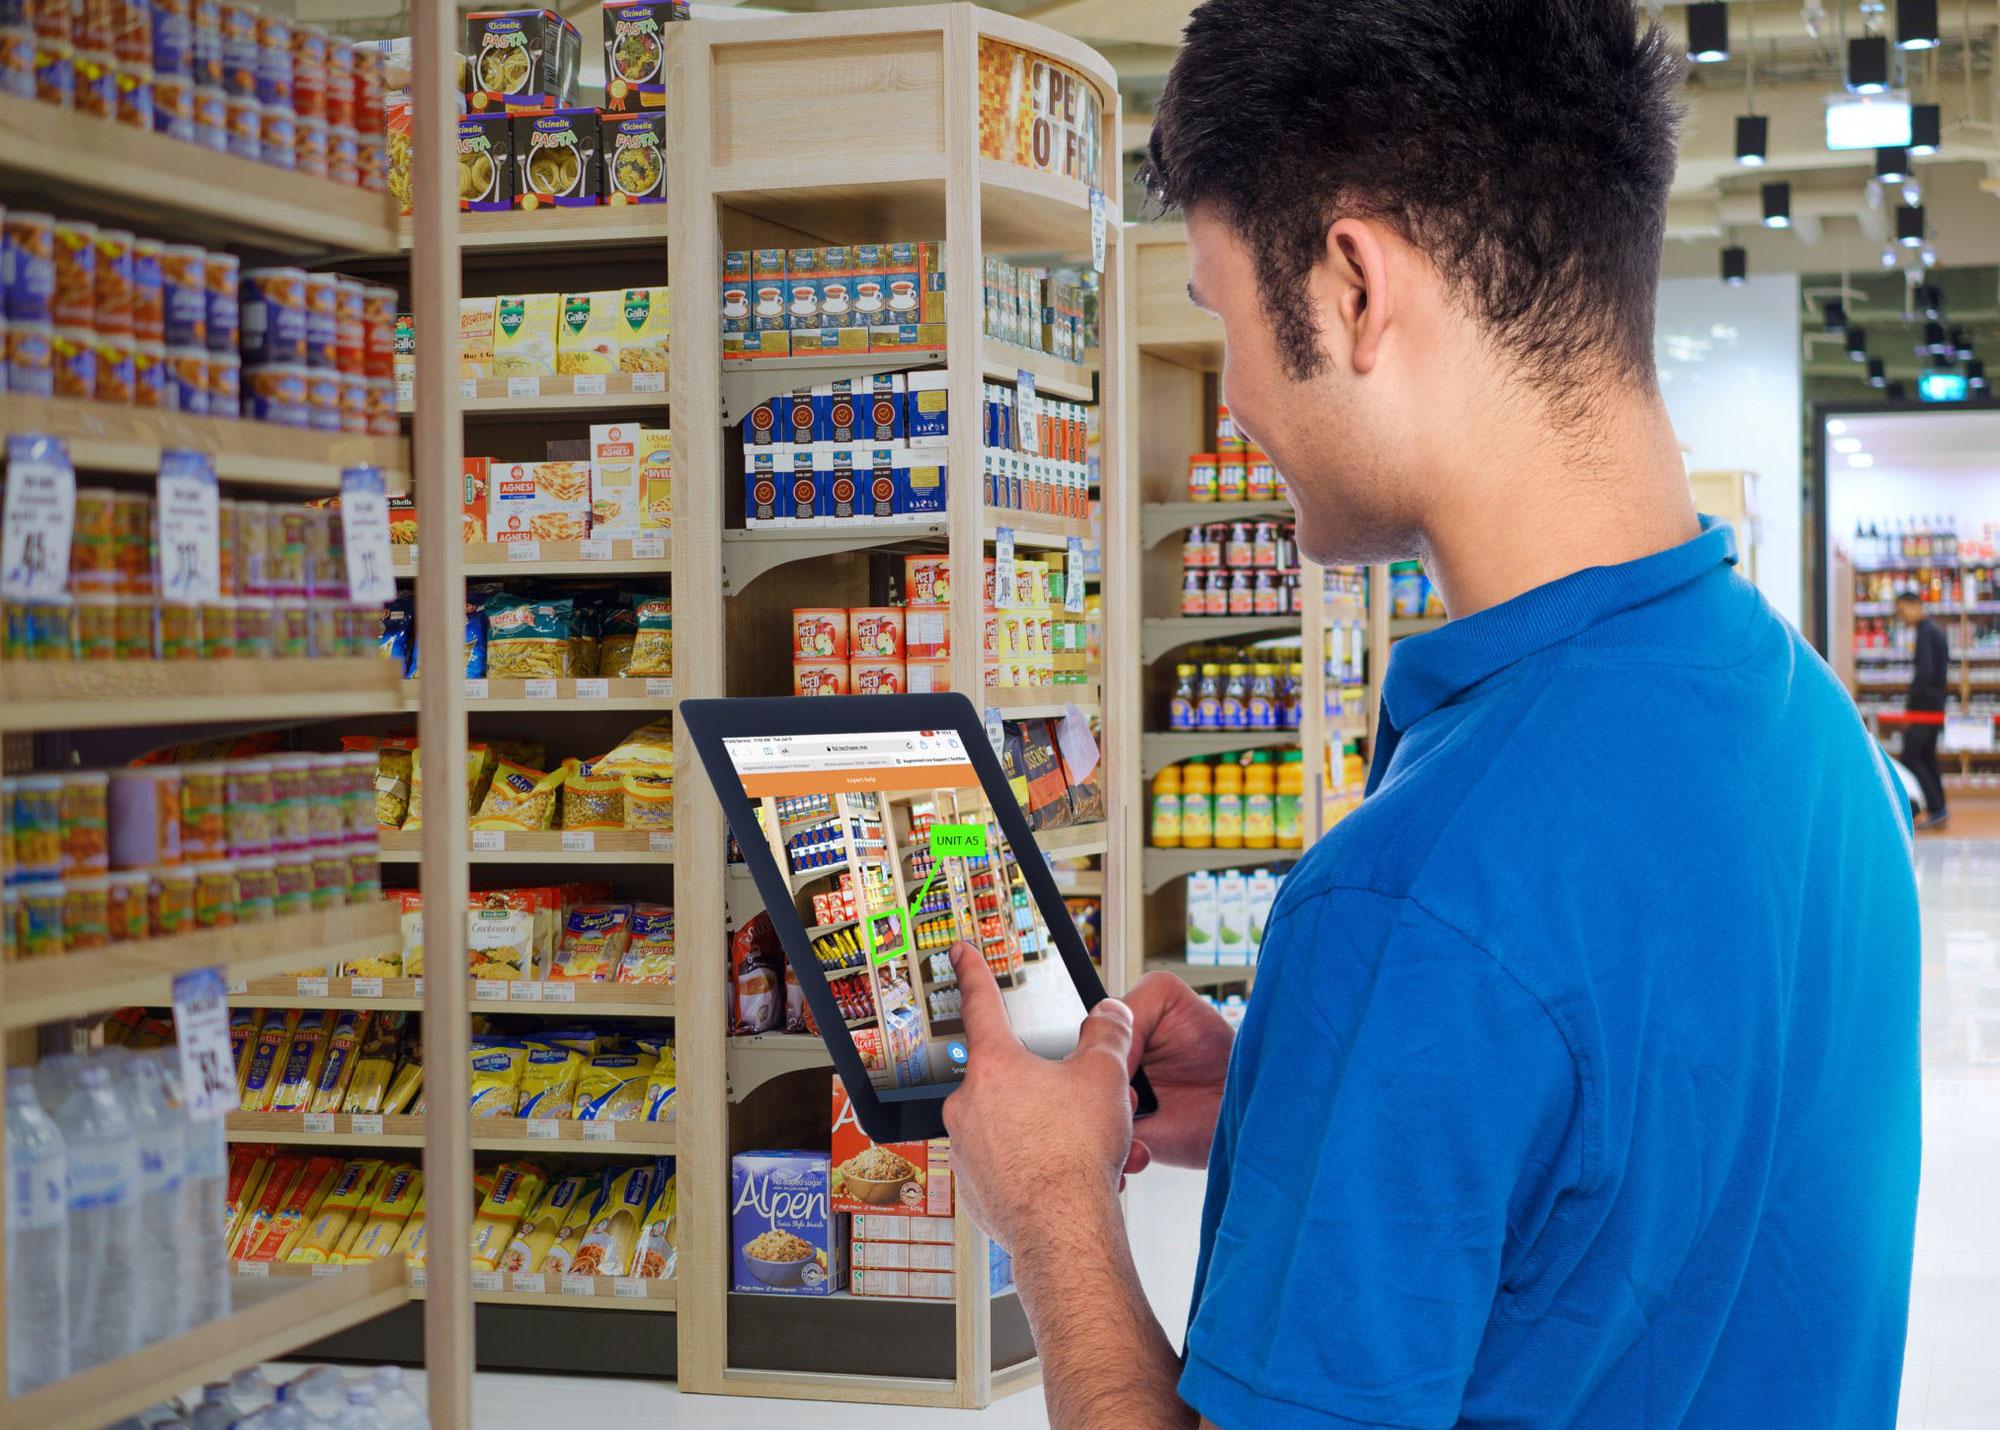 ARとコンピュータビジョンによるCPG(消費財)在庫管理の変革